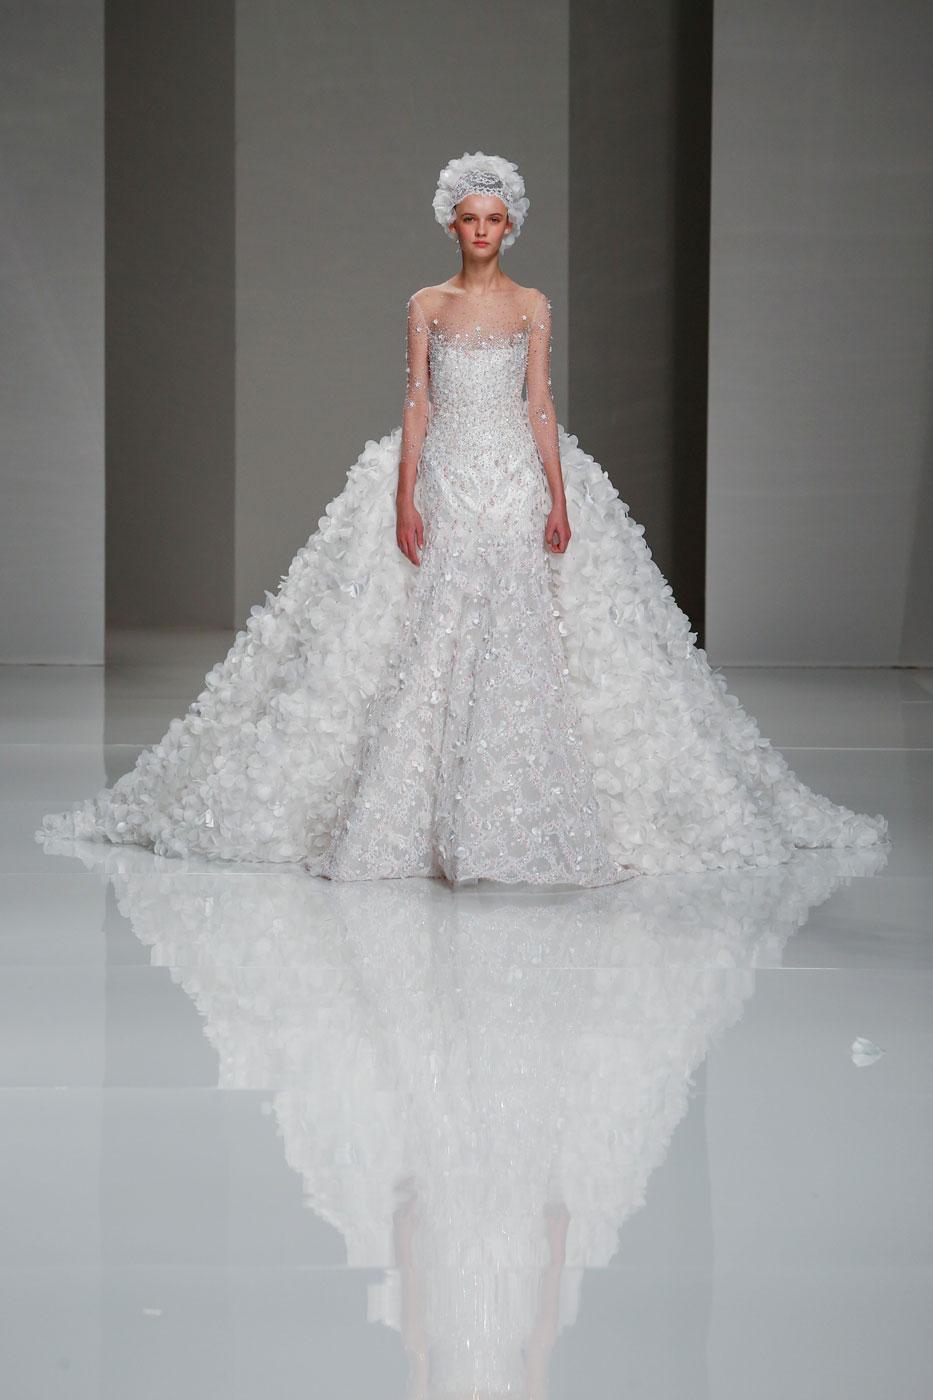 Georges-Hobeika-fashion-runway-show-haute-couture-paris-spring-2015-the-impression-85